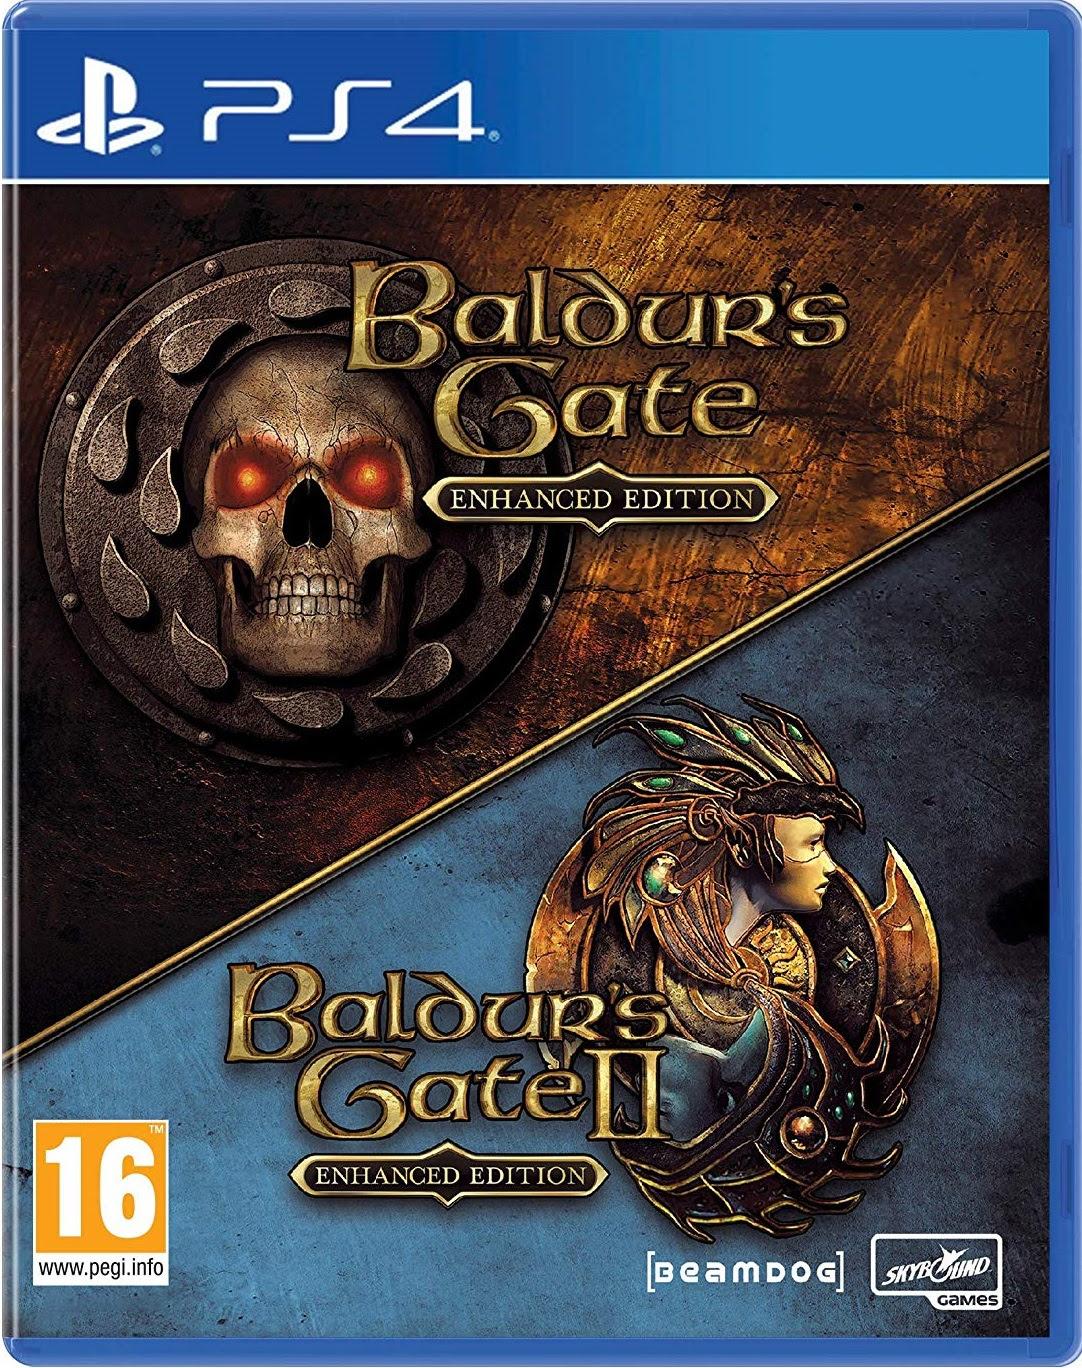 Baldurs Gate 1+2 Enhanced Edition